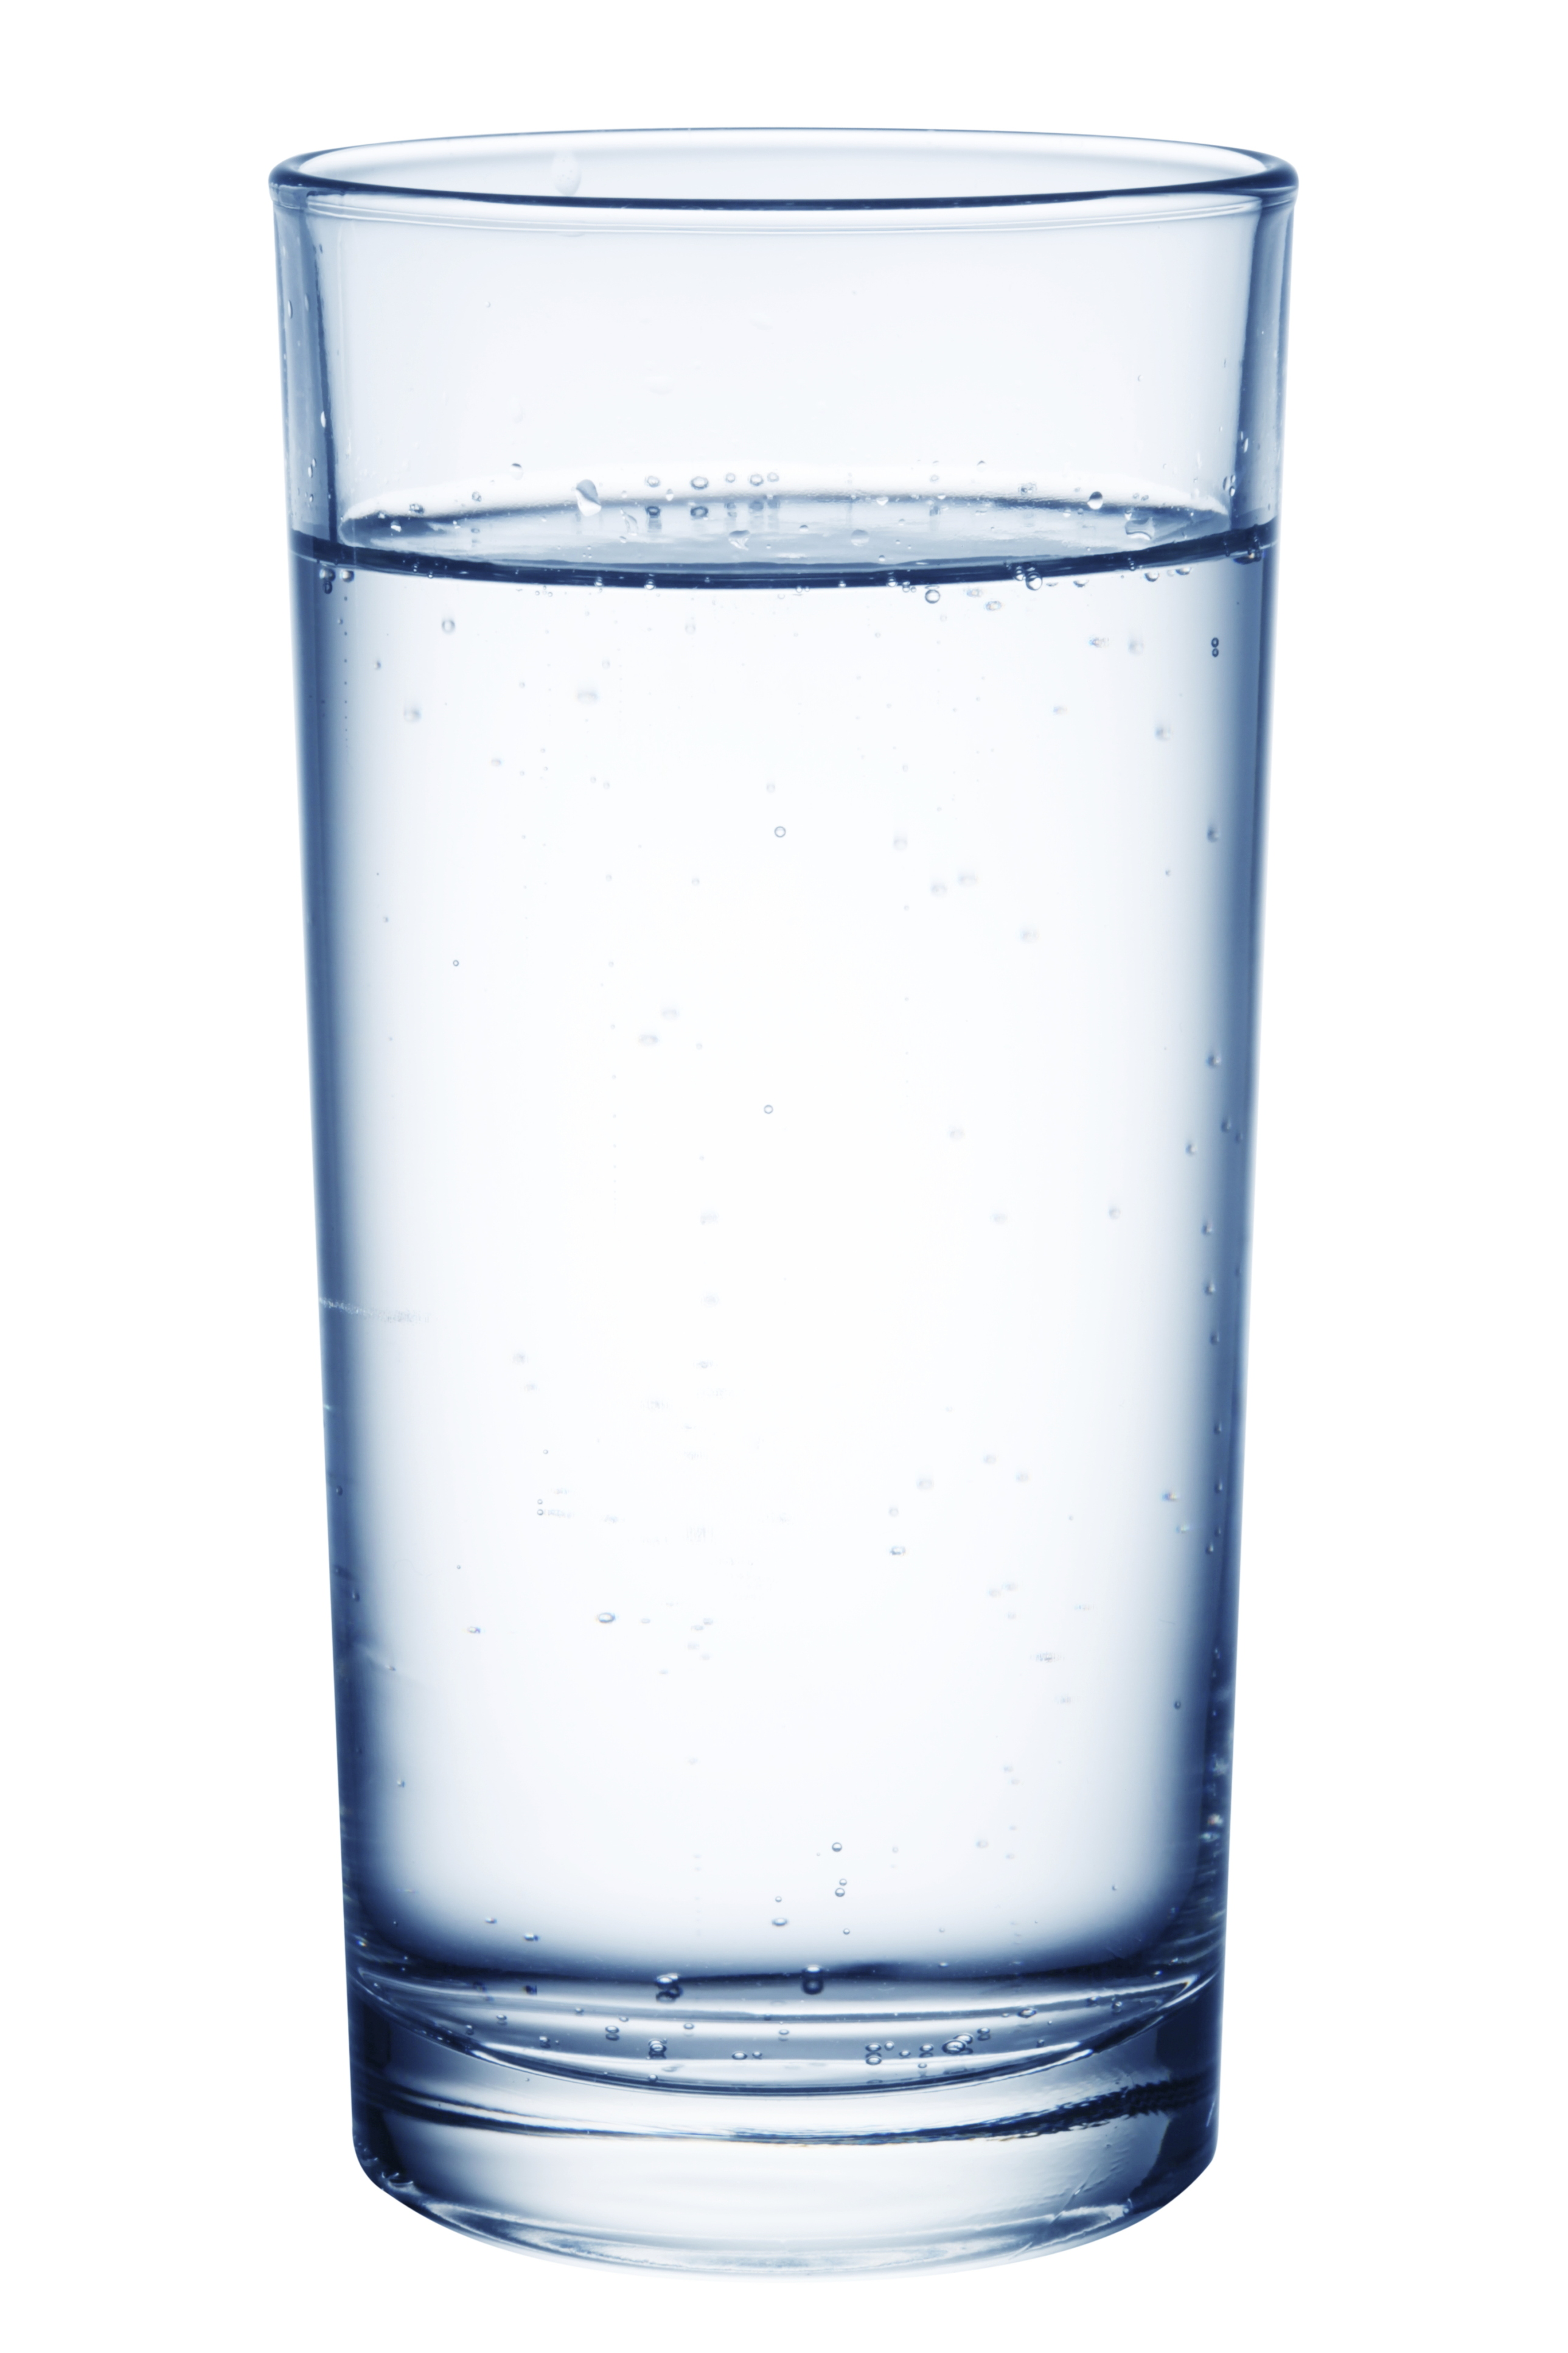 free photo glass of water drink glass liquid free download jooinn